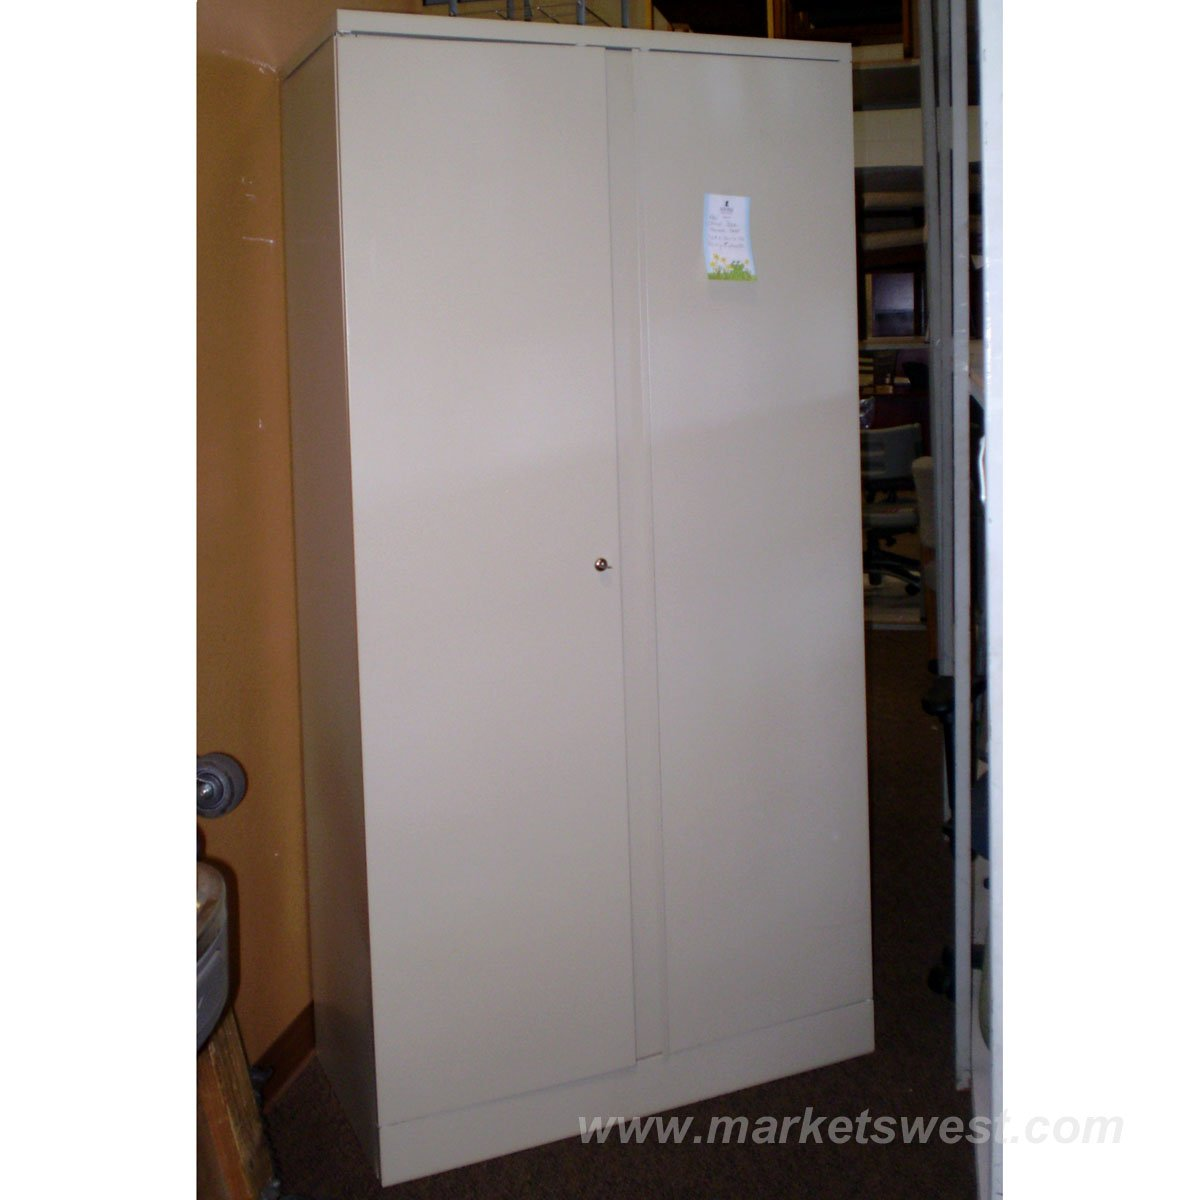 2 Door Office Star Storage Cabinet 36 W X 18 D X 72 H Used